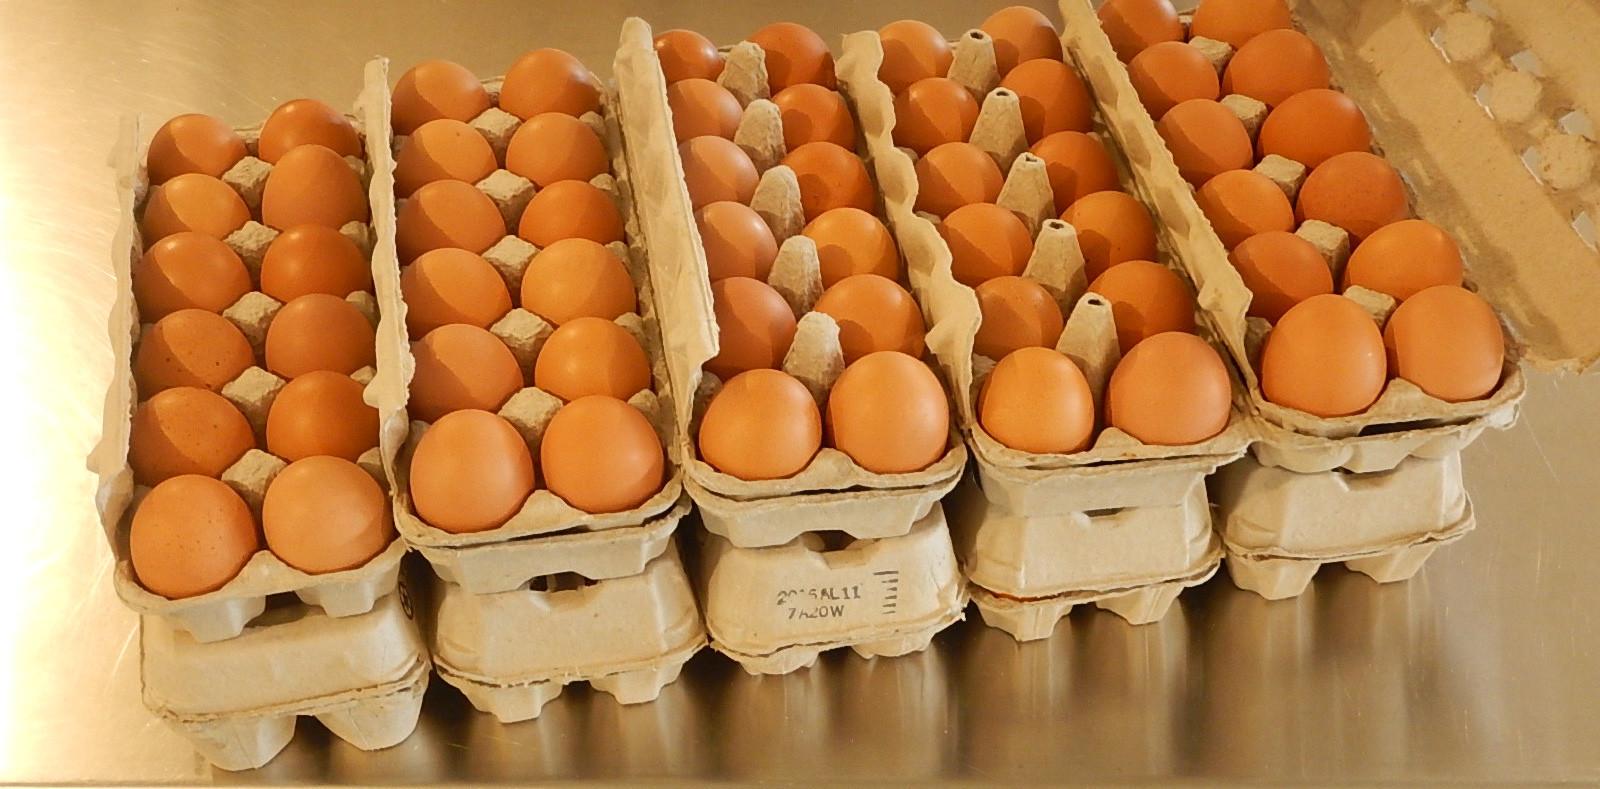 10 X 1 Dozen Eggs